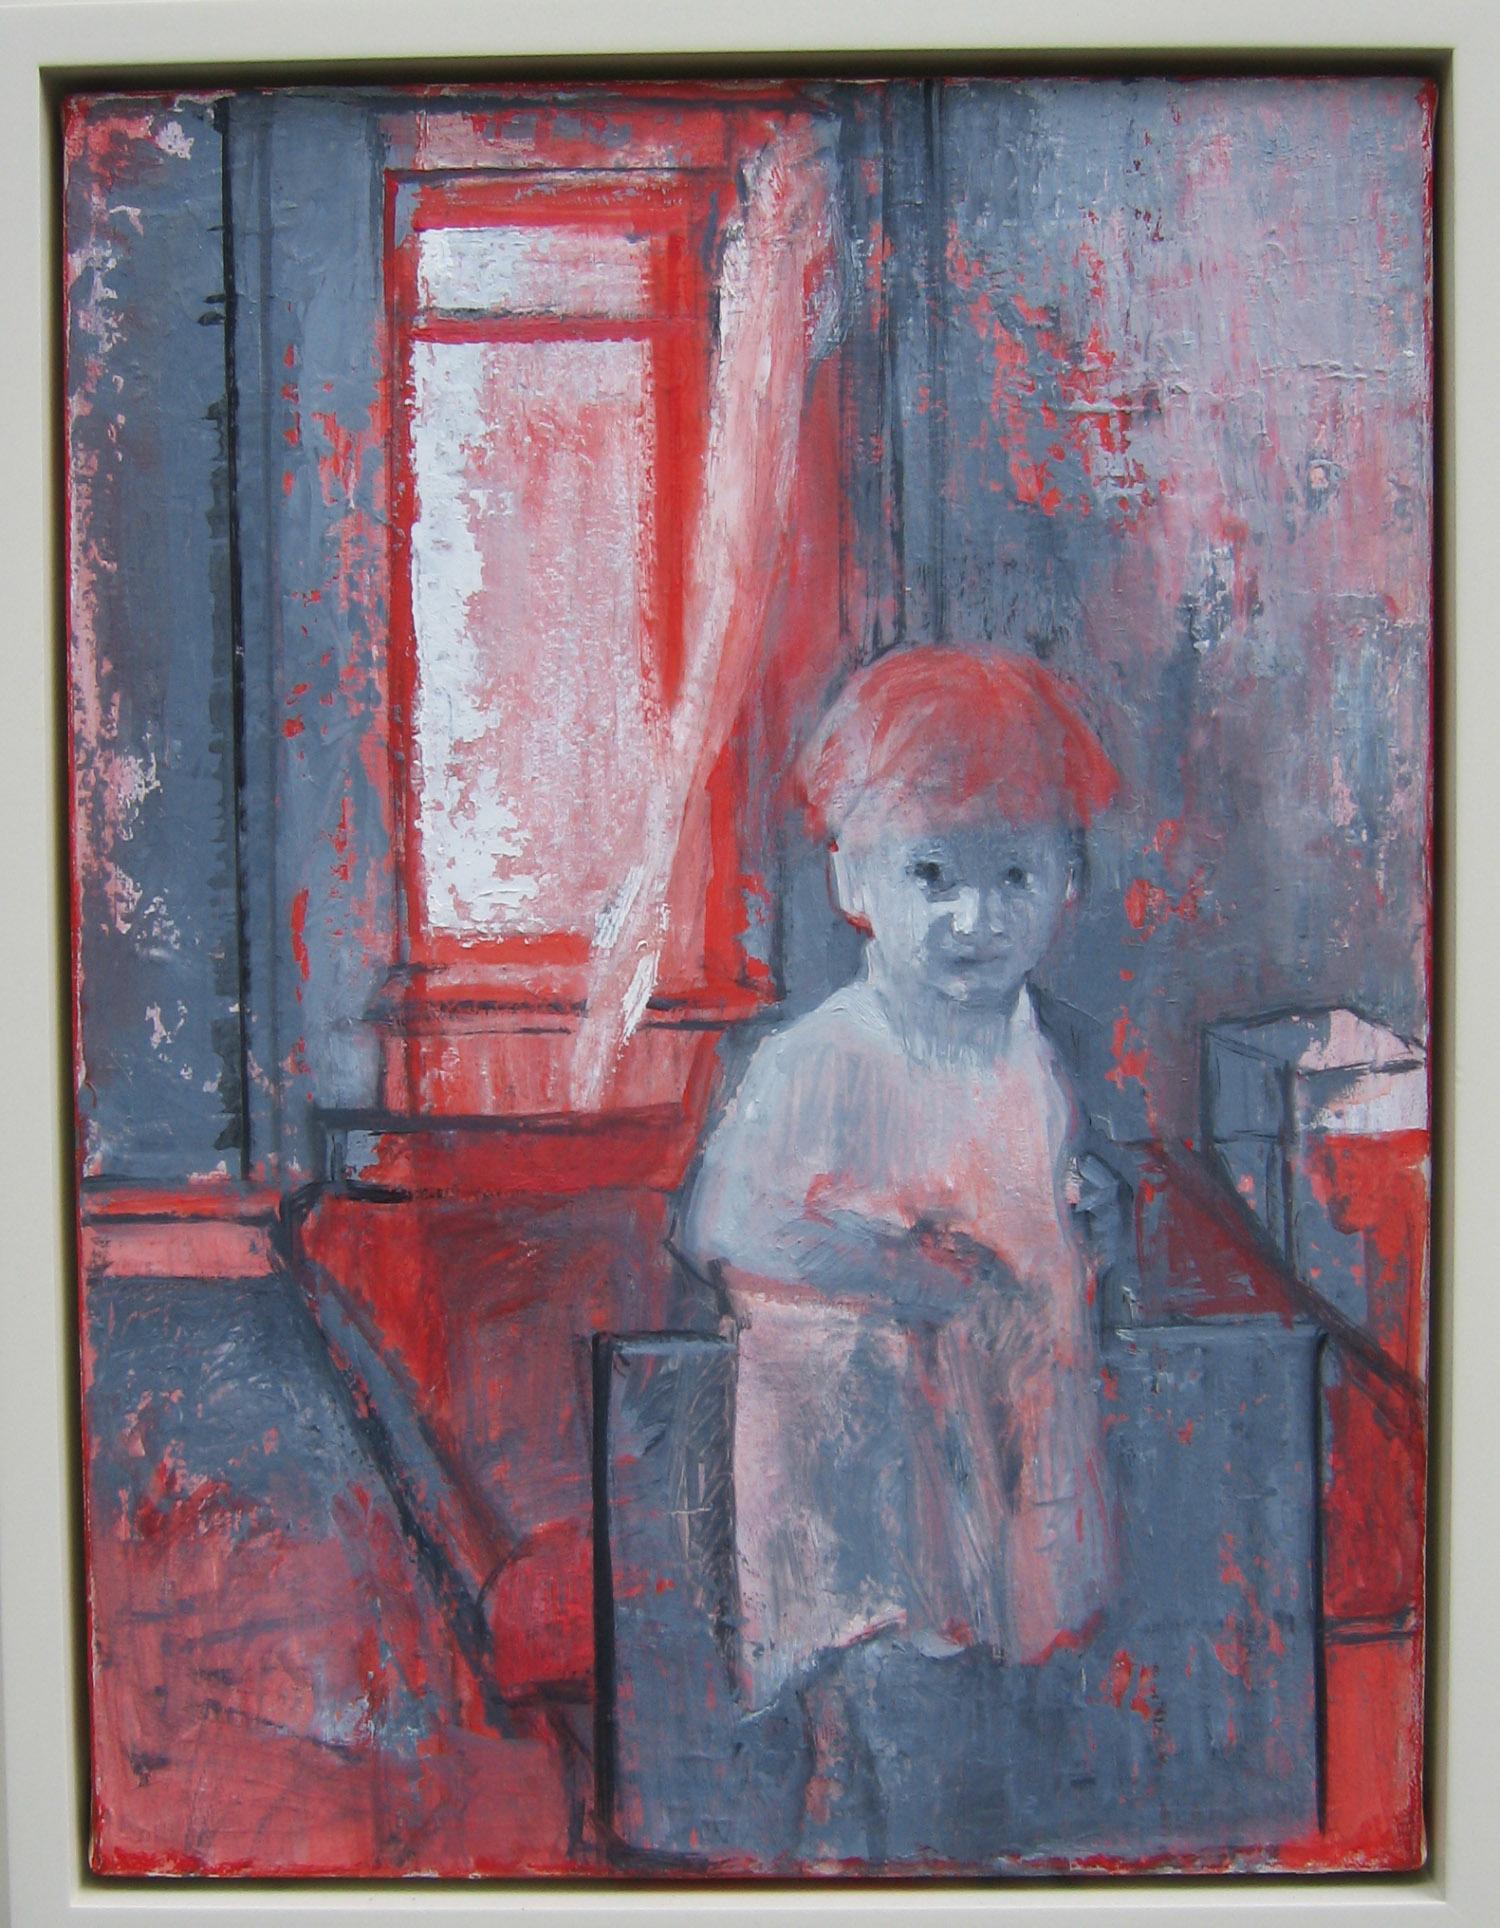 5bf(0)- Hesitation, oil, wax on canvas, wood, 23x19 in. 2005.jpg